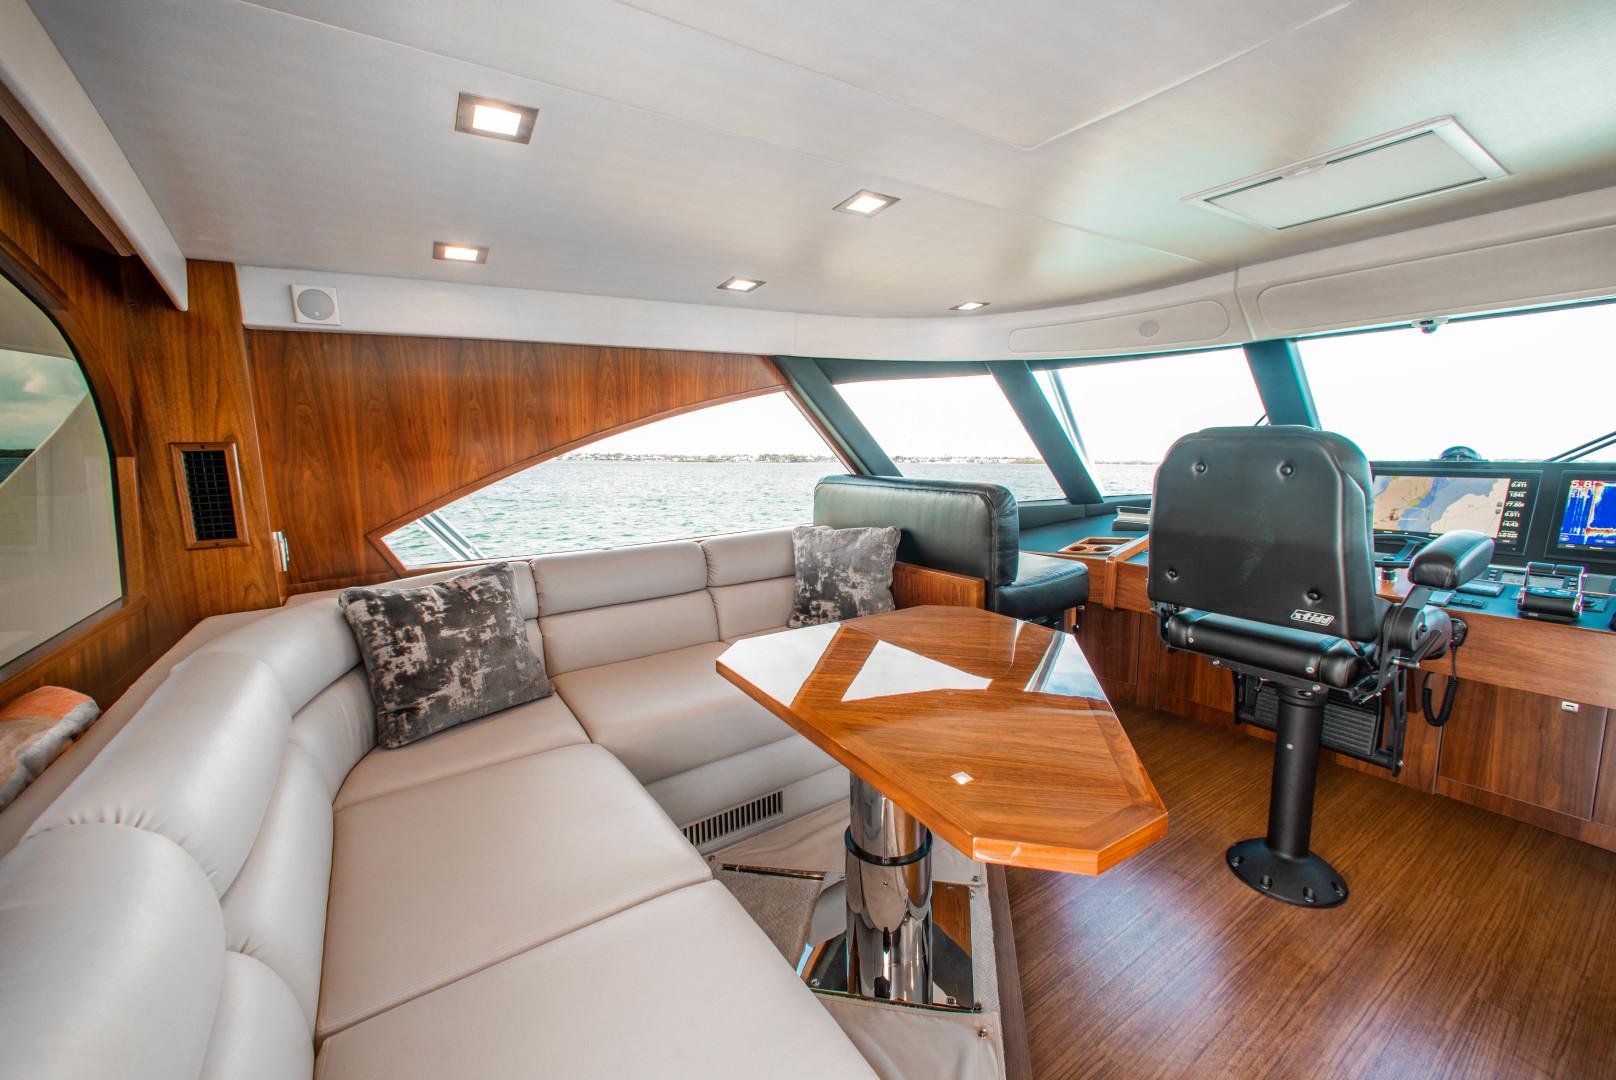 Viking-72 Enclosed Bridge 2018-Red Lion Ocean Reef-Florida-United States-2018 Viking 72 Enclosed Bridge  Red Lion  Enclosed Bridge-1568247   Thumbnail